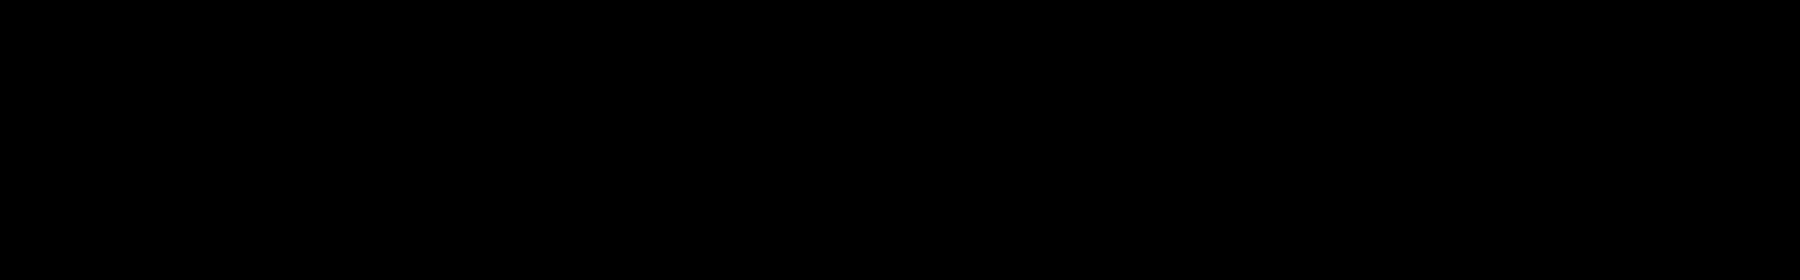 AAA Game Character Undead audio waveform